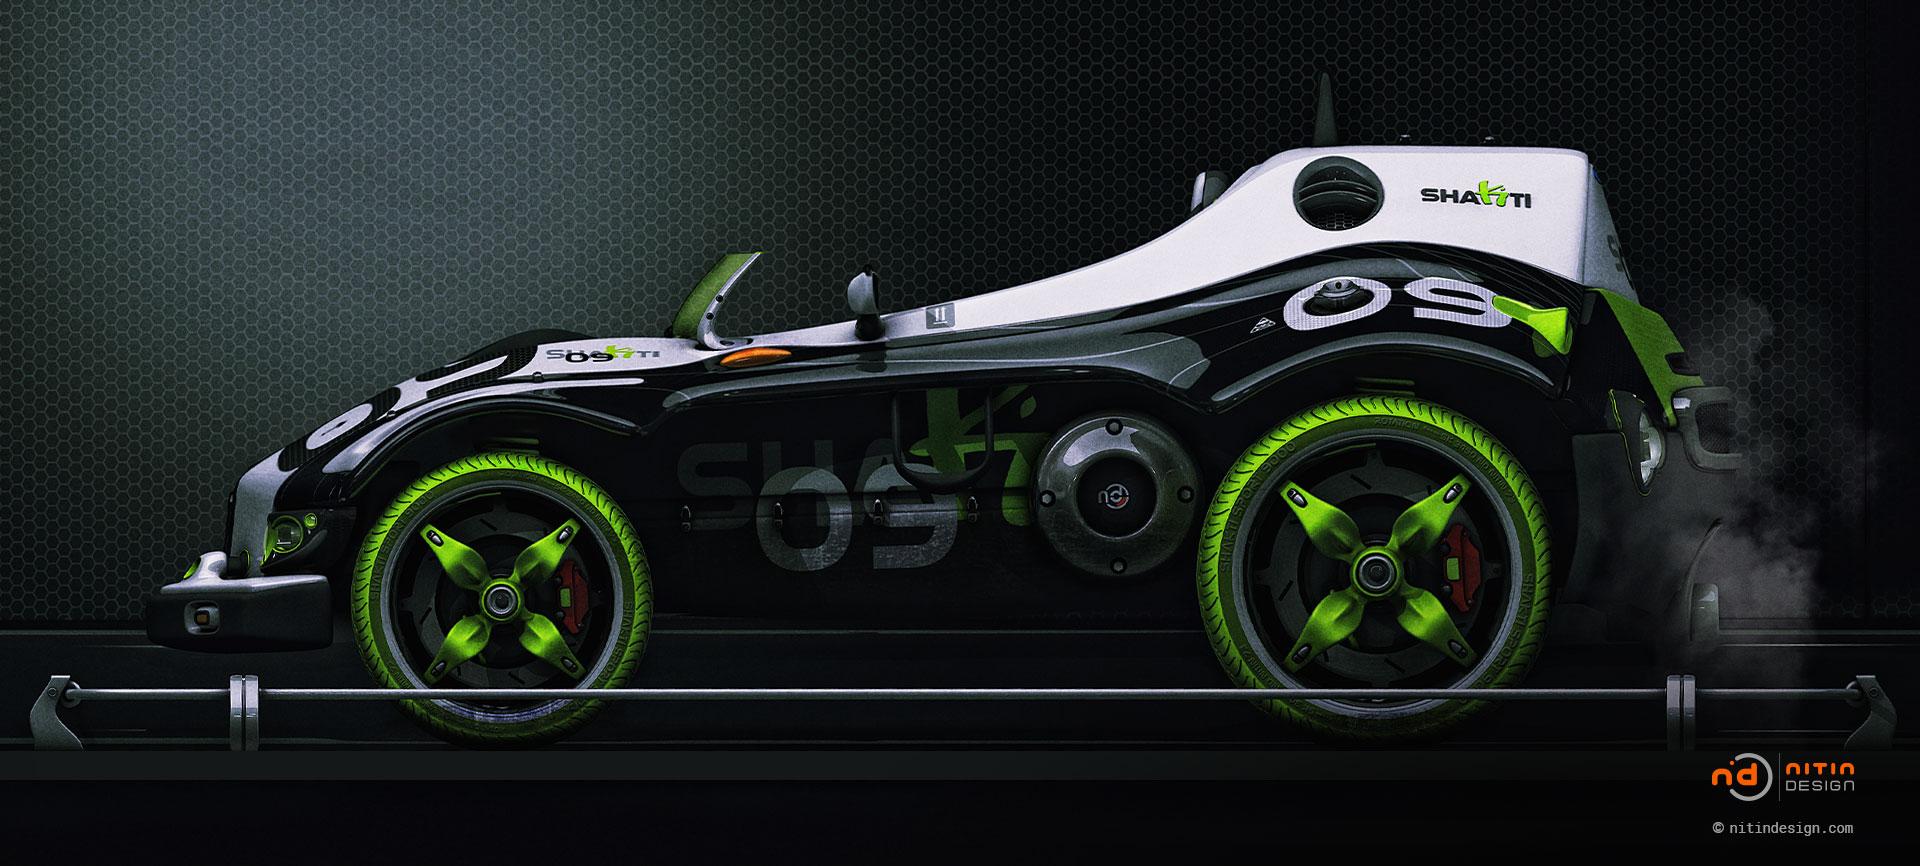 Shakti-Concept-Car-Nitin-Design